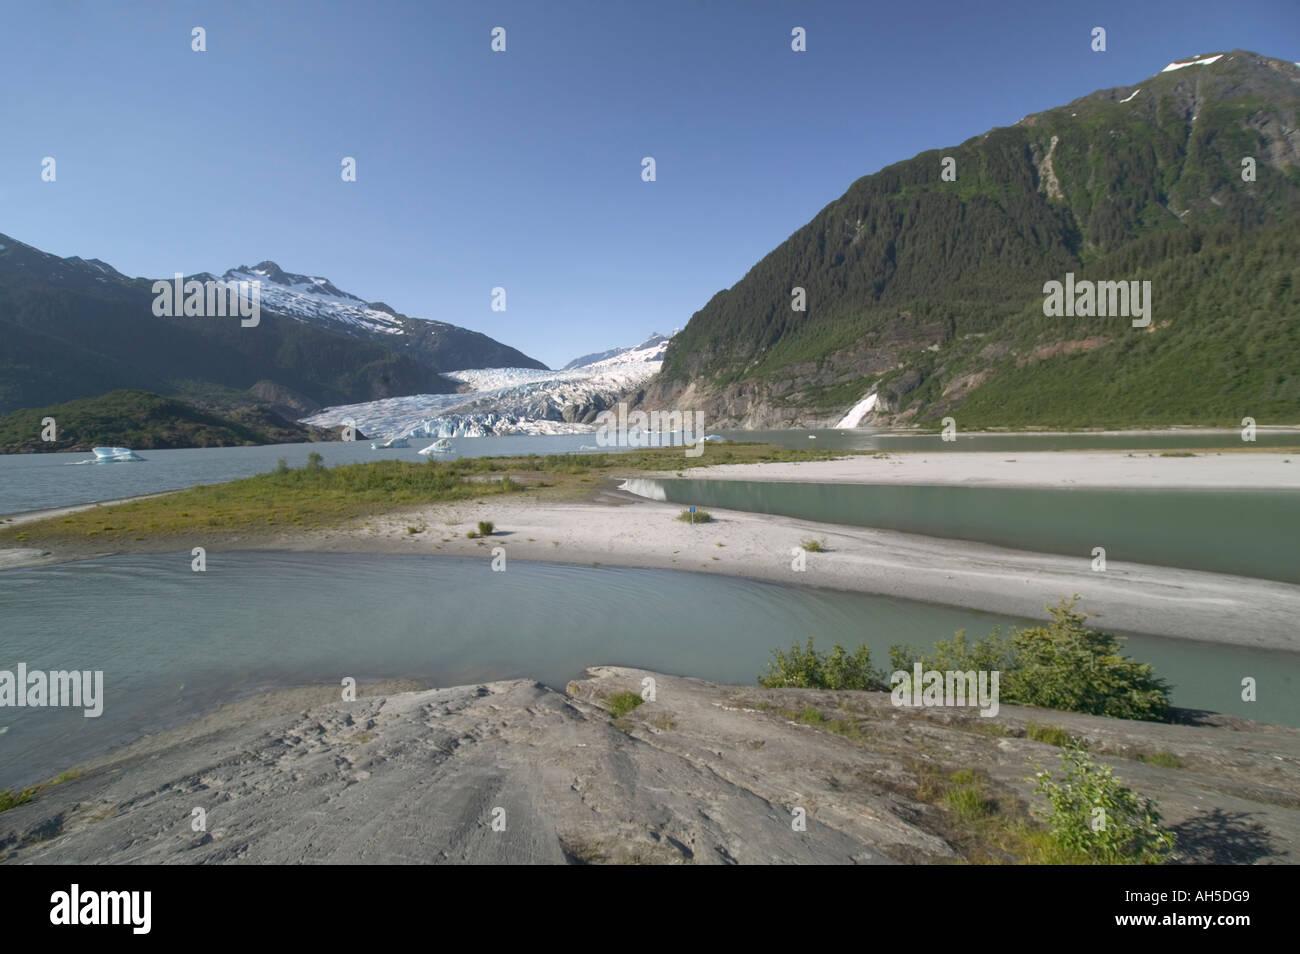 Mendenhall Glacier Juneau Alaska USA - Stock Image